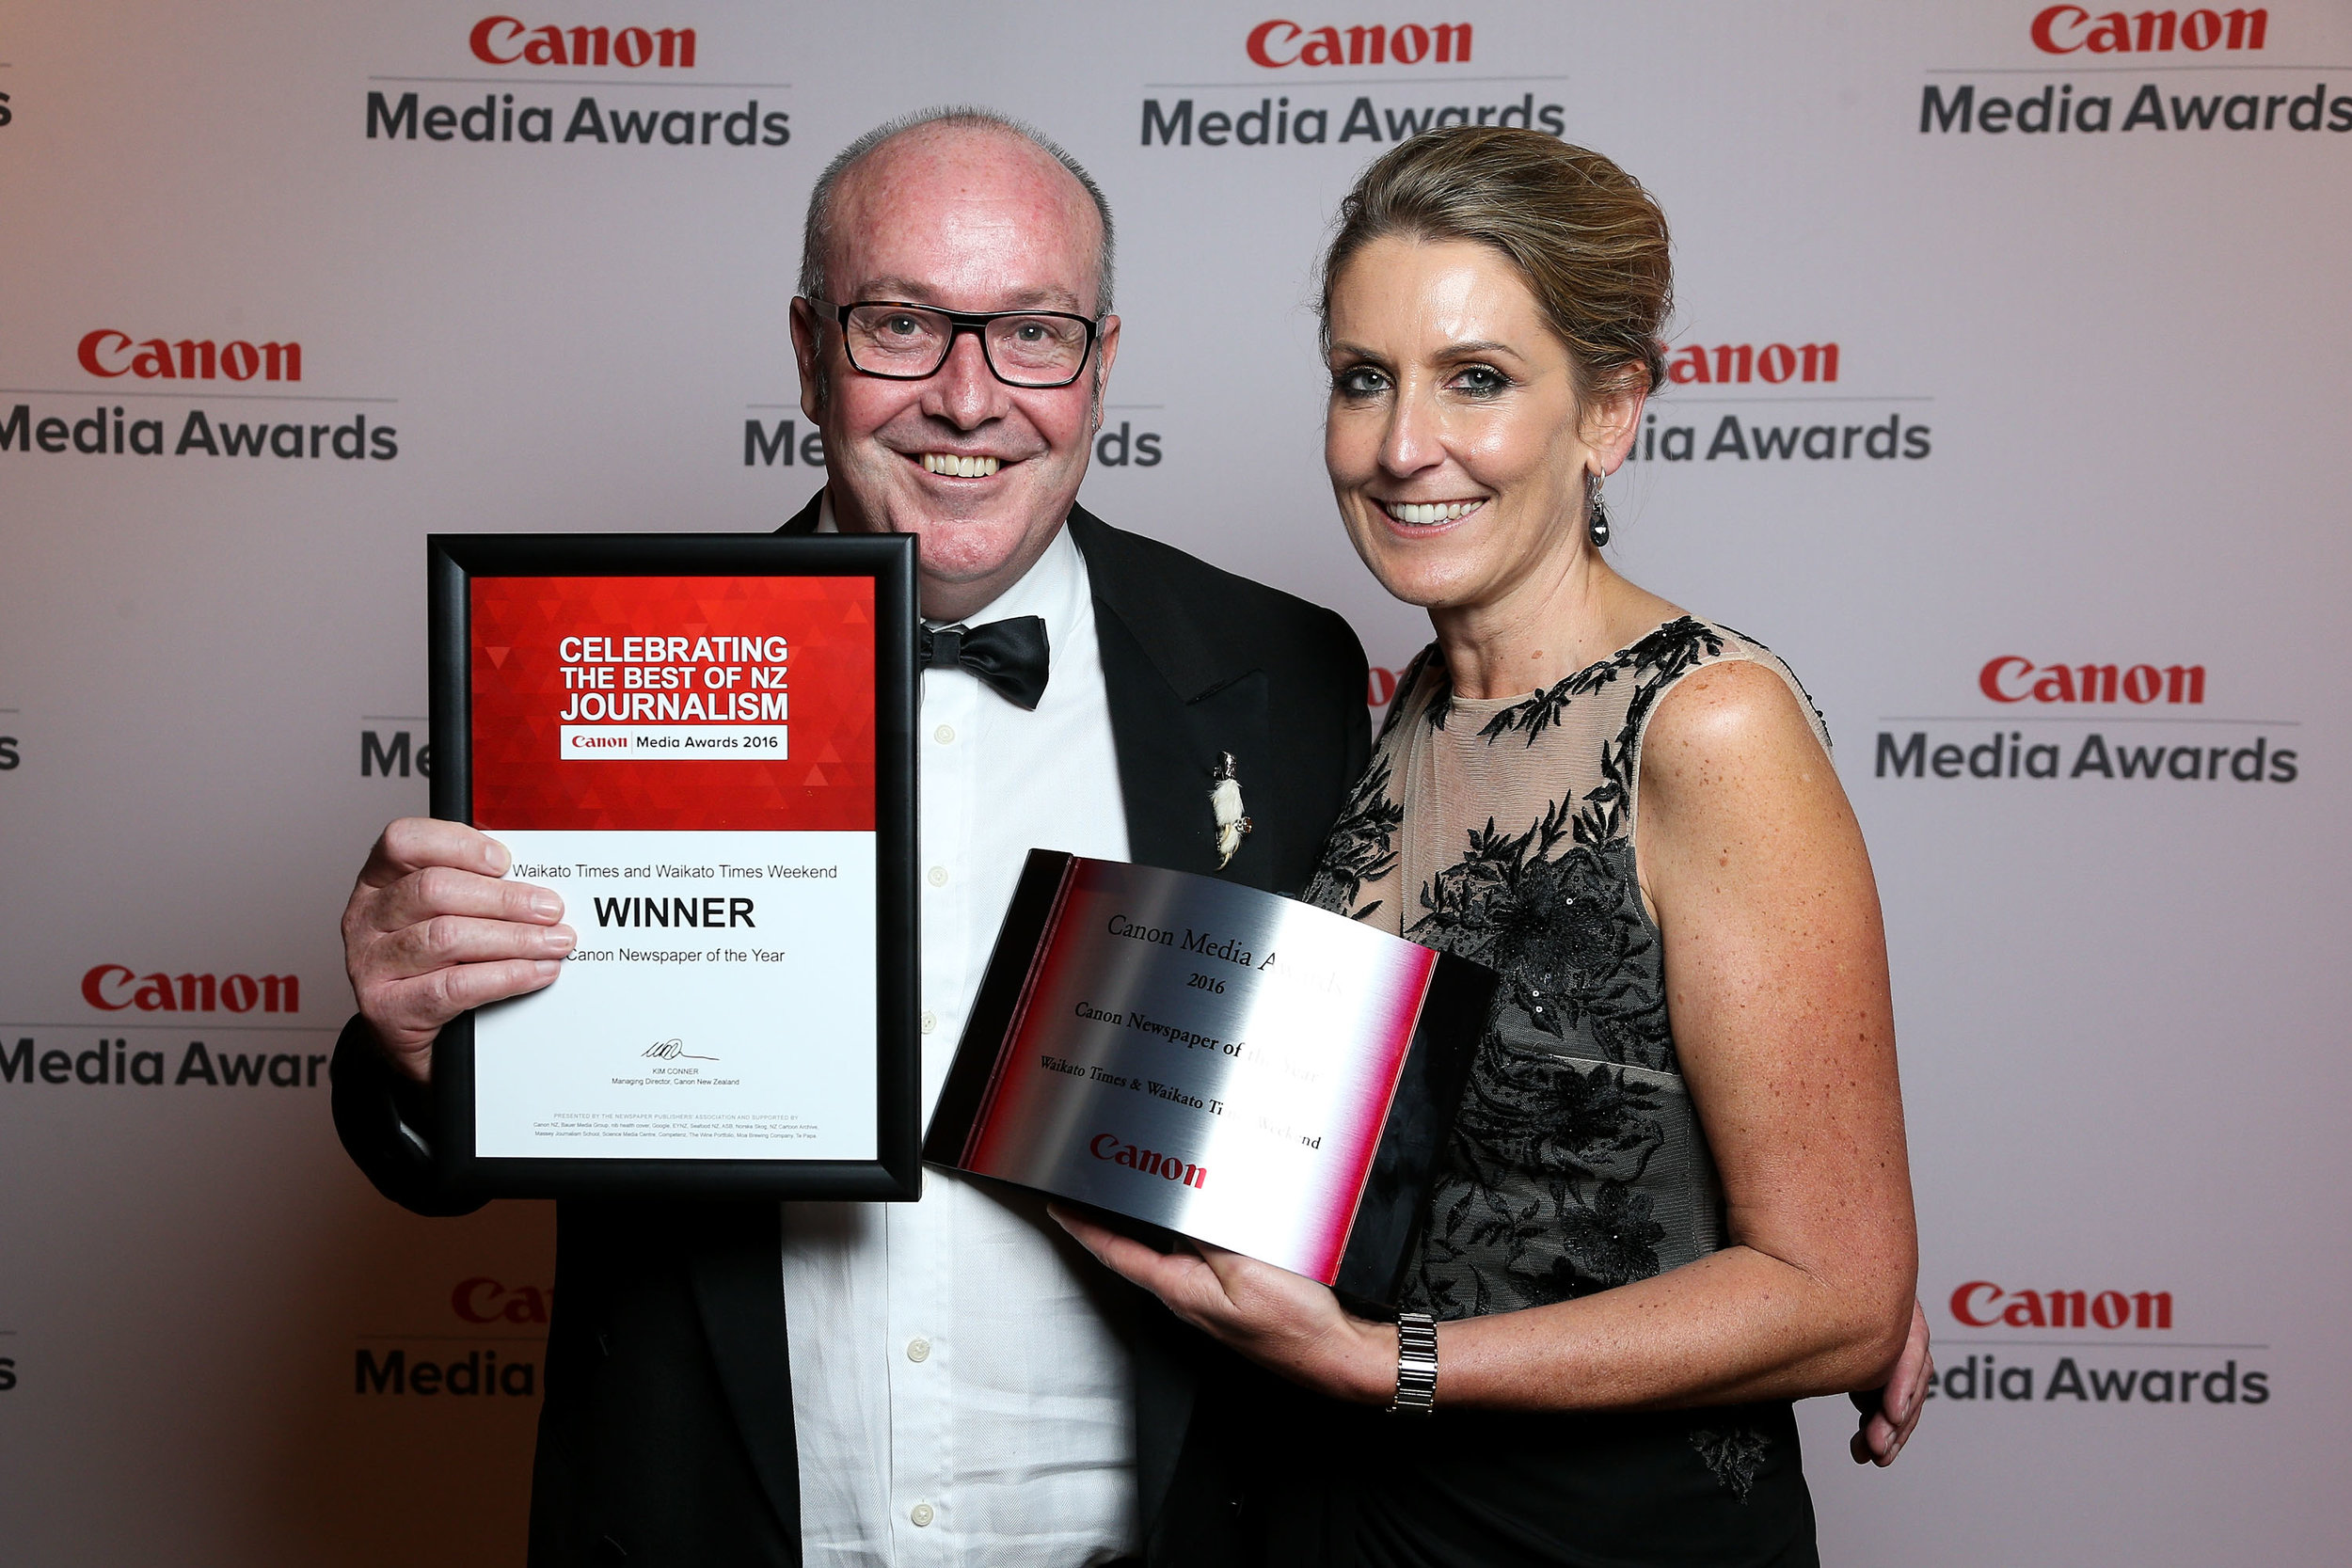 160520_Canon_Media_Awards_43.JPG